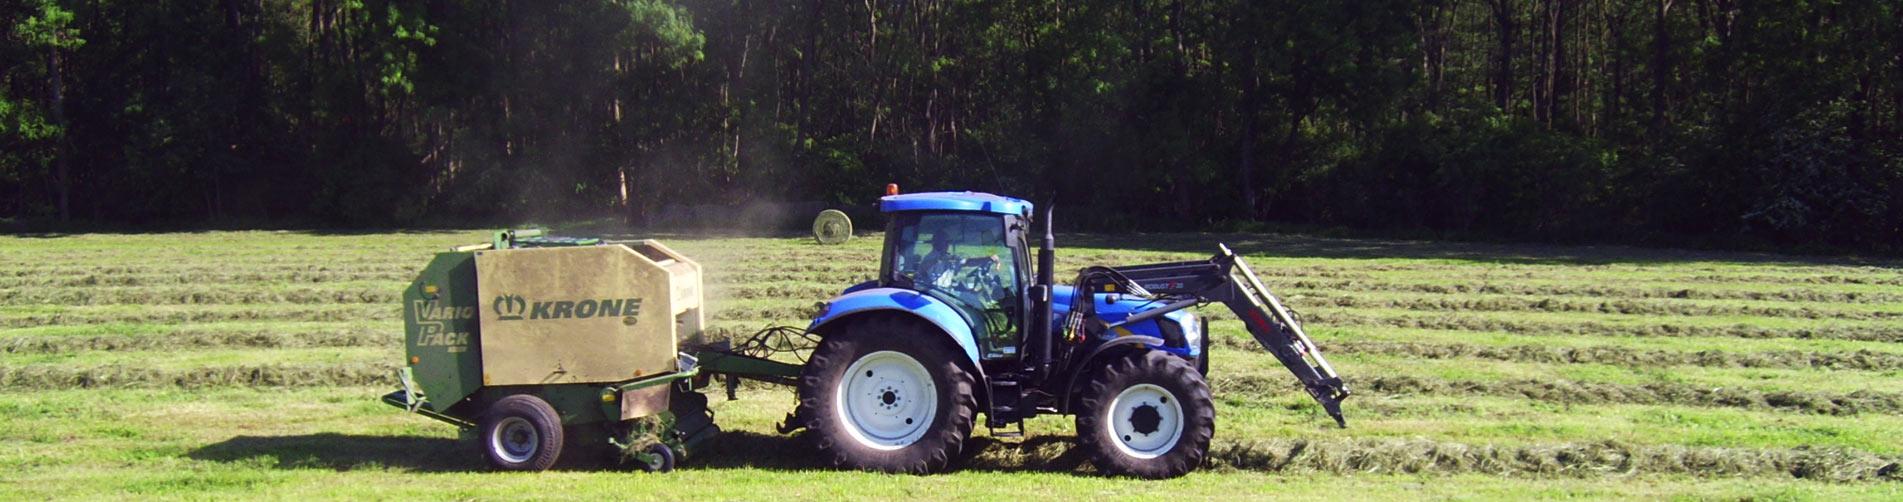 Traktor - Müritz-Hof Knust